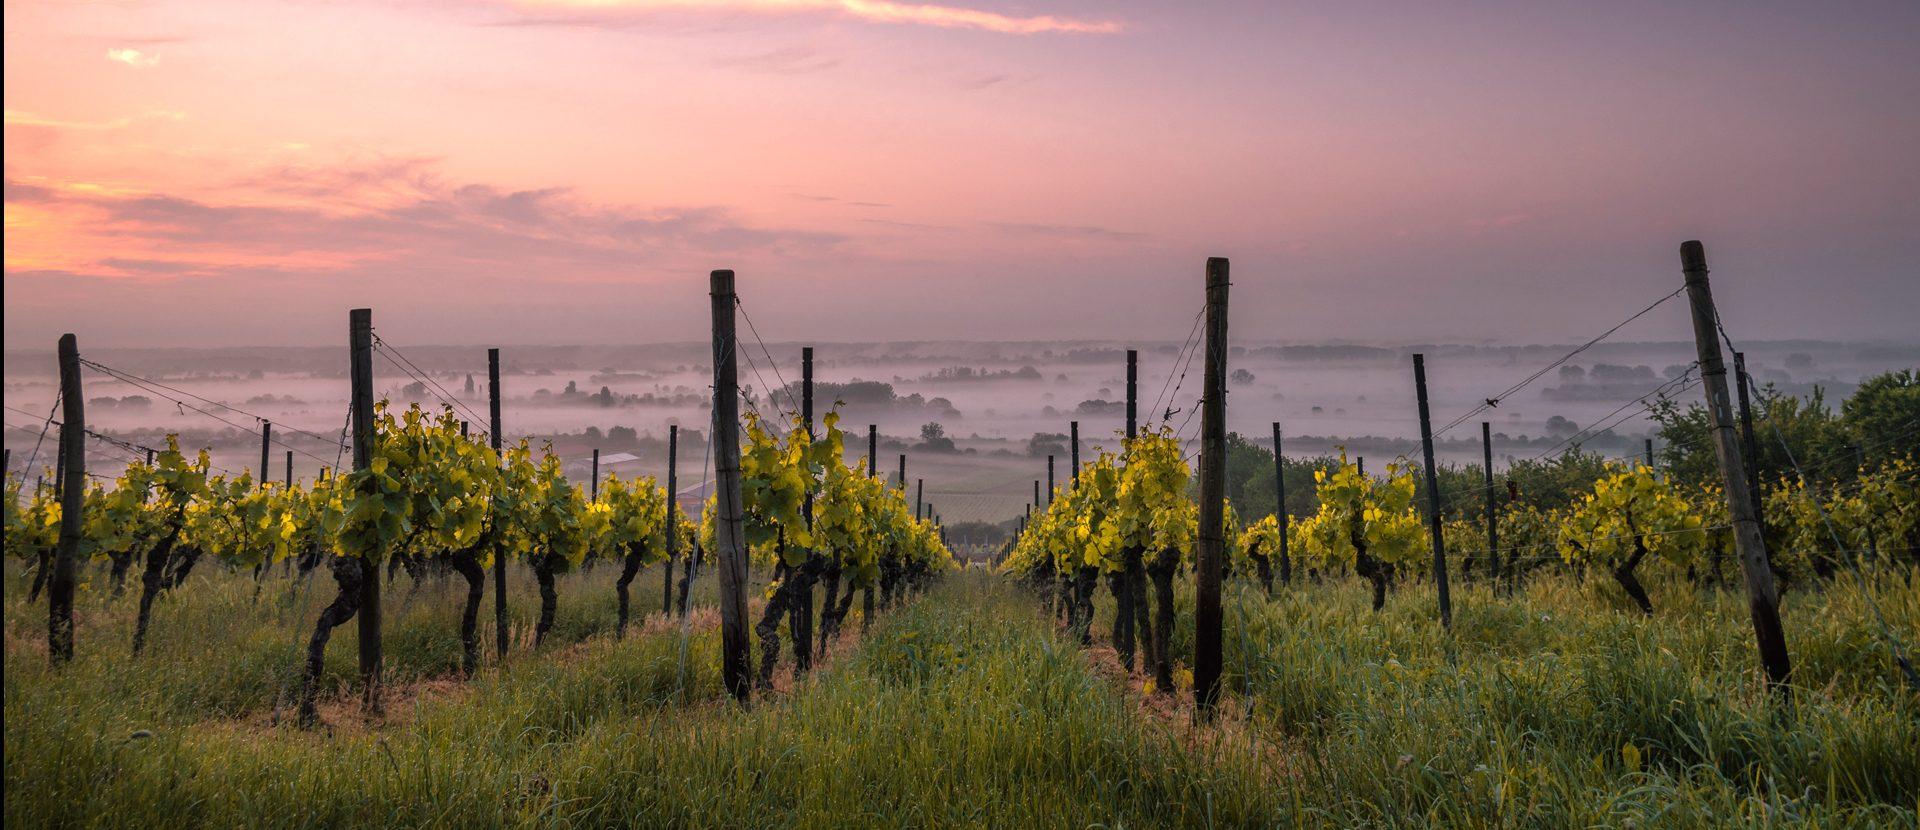 Conoce la nueva Ruta del Vino Aguascalientes